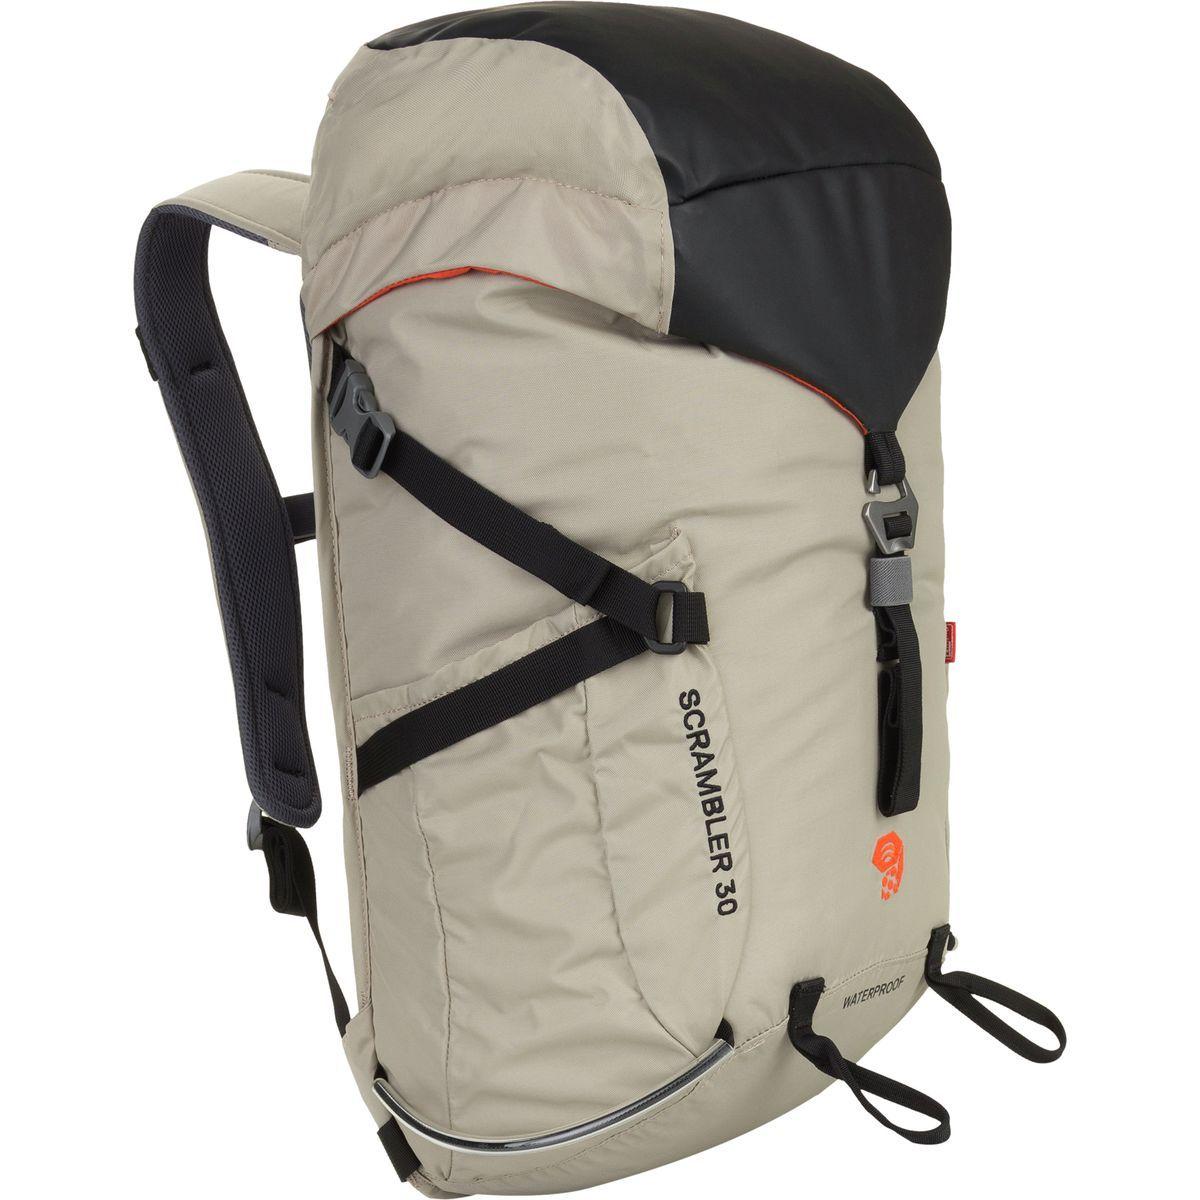 77d18e1662b52 Mountain Hardwear - Scrambler Outdry 30L Backpack - Badlands